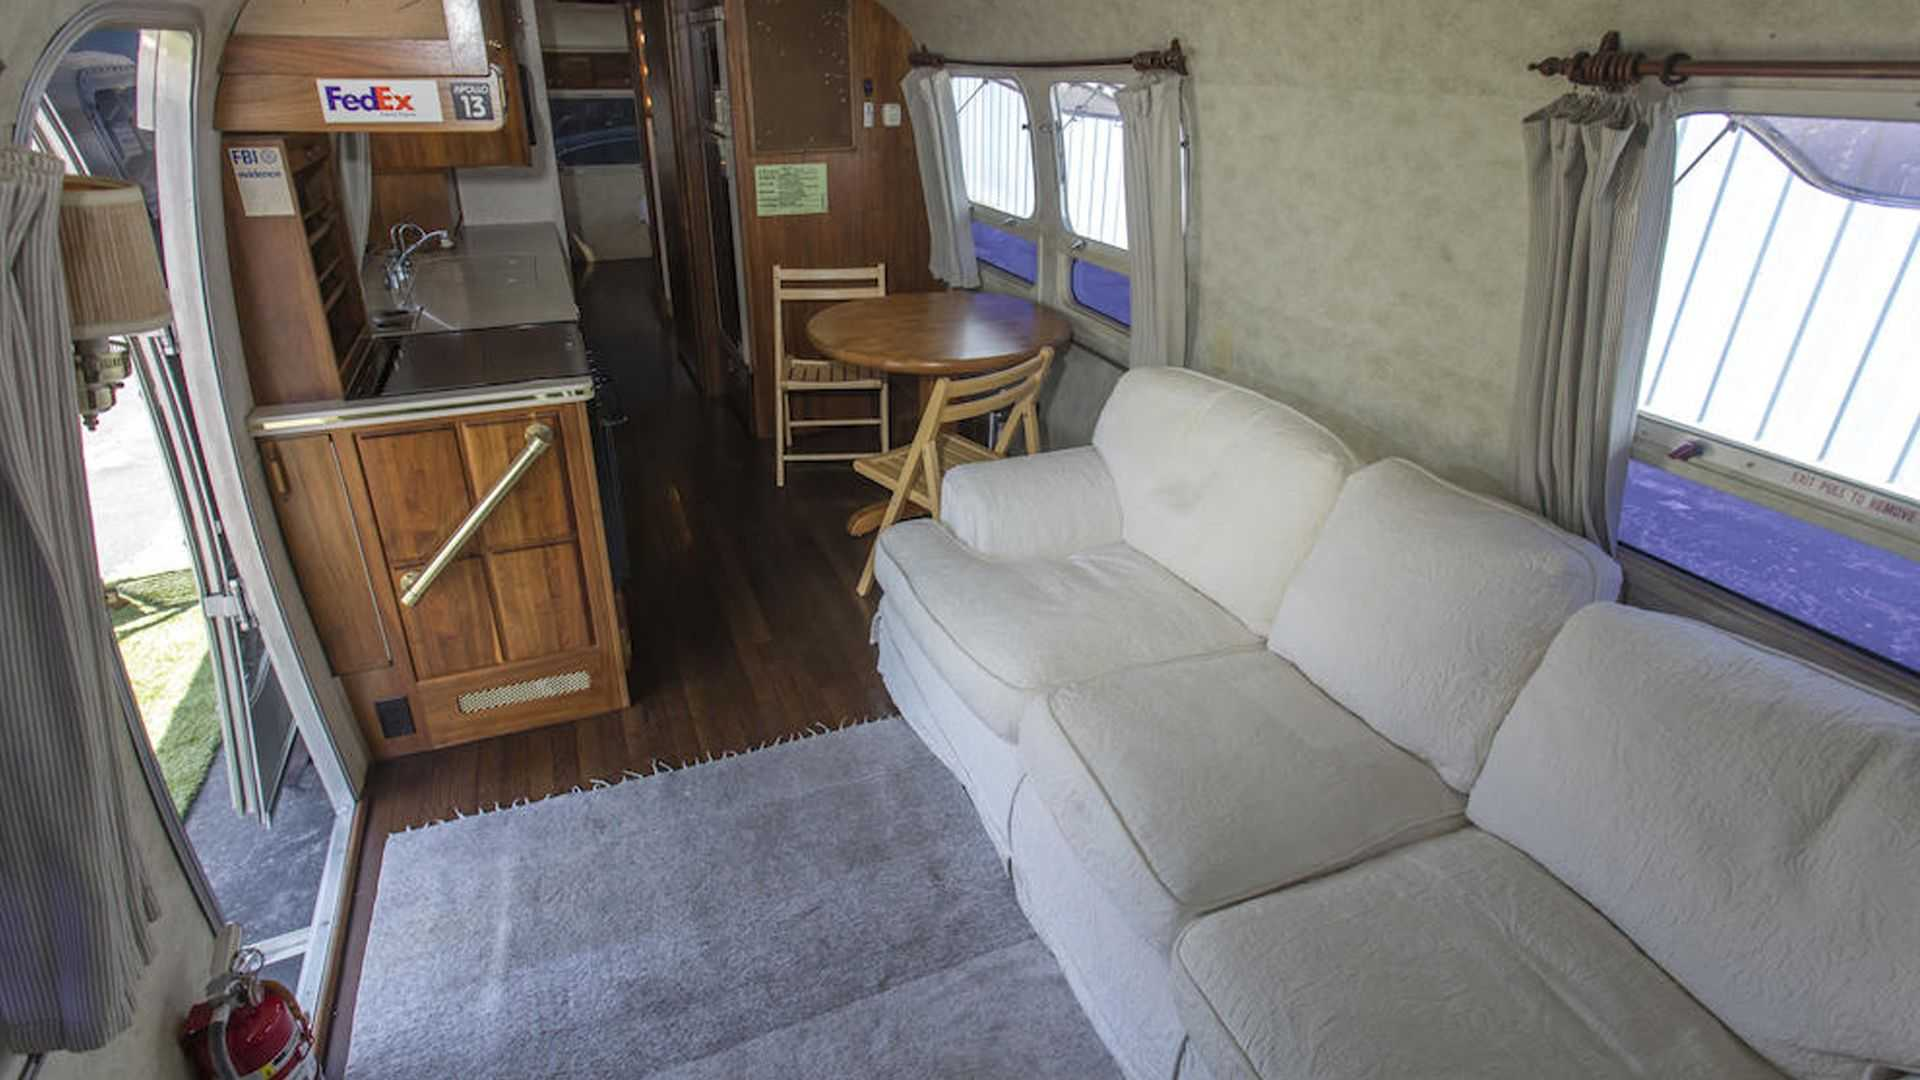 Tom-Hanks-Airstream-trailer-for-sale-16